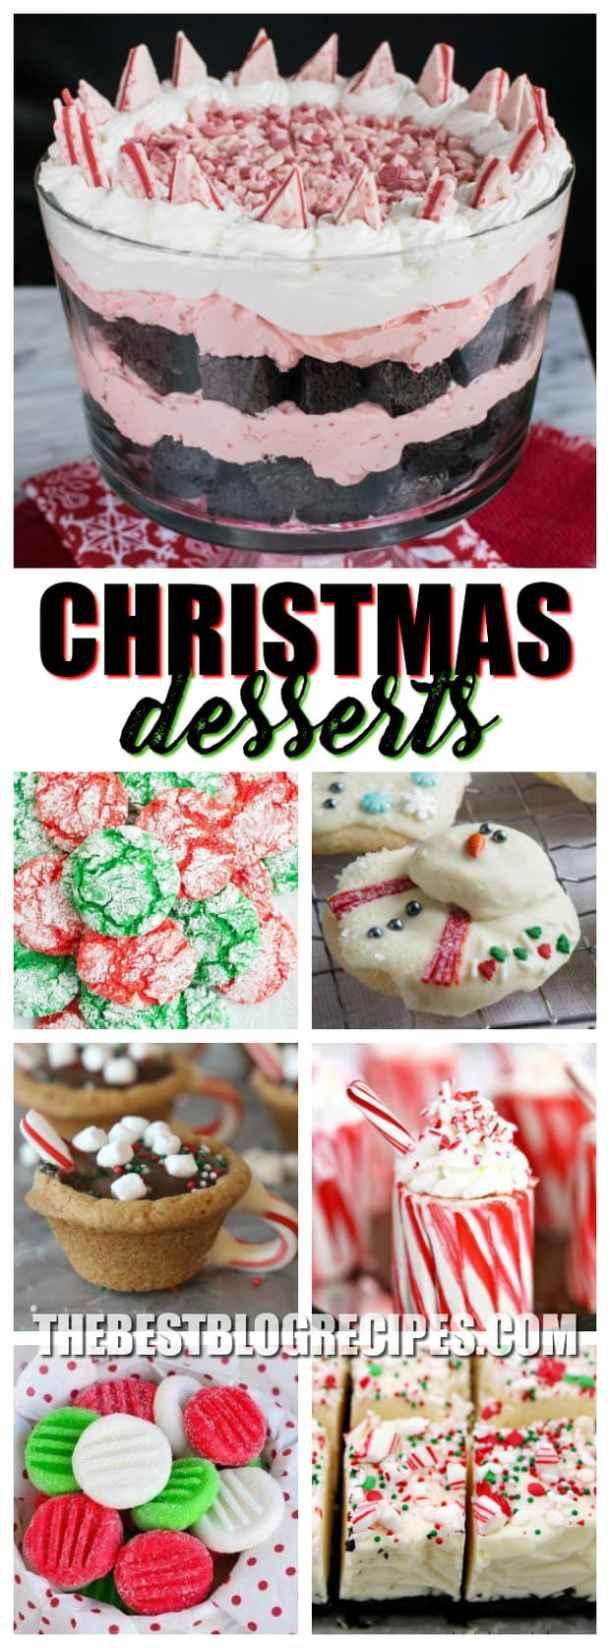 Fun Festive Christmas Desserts